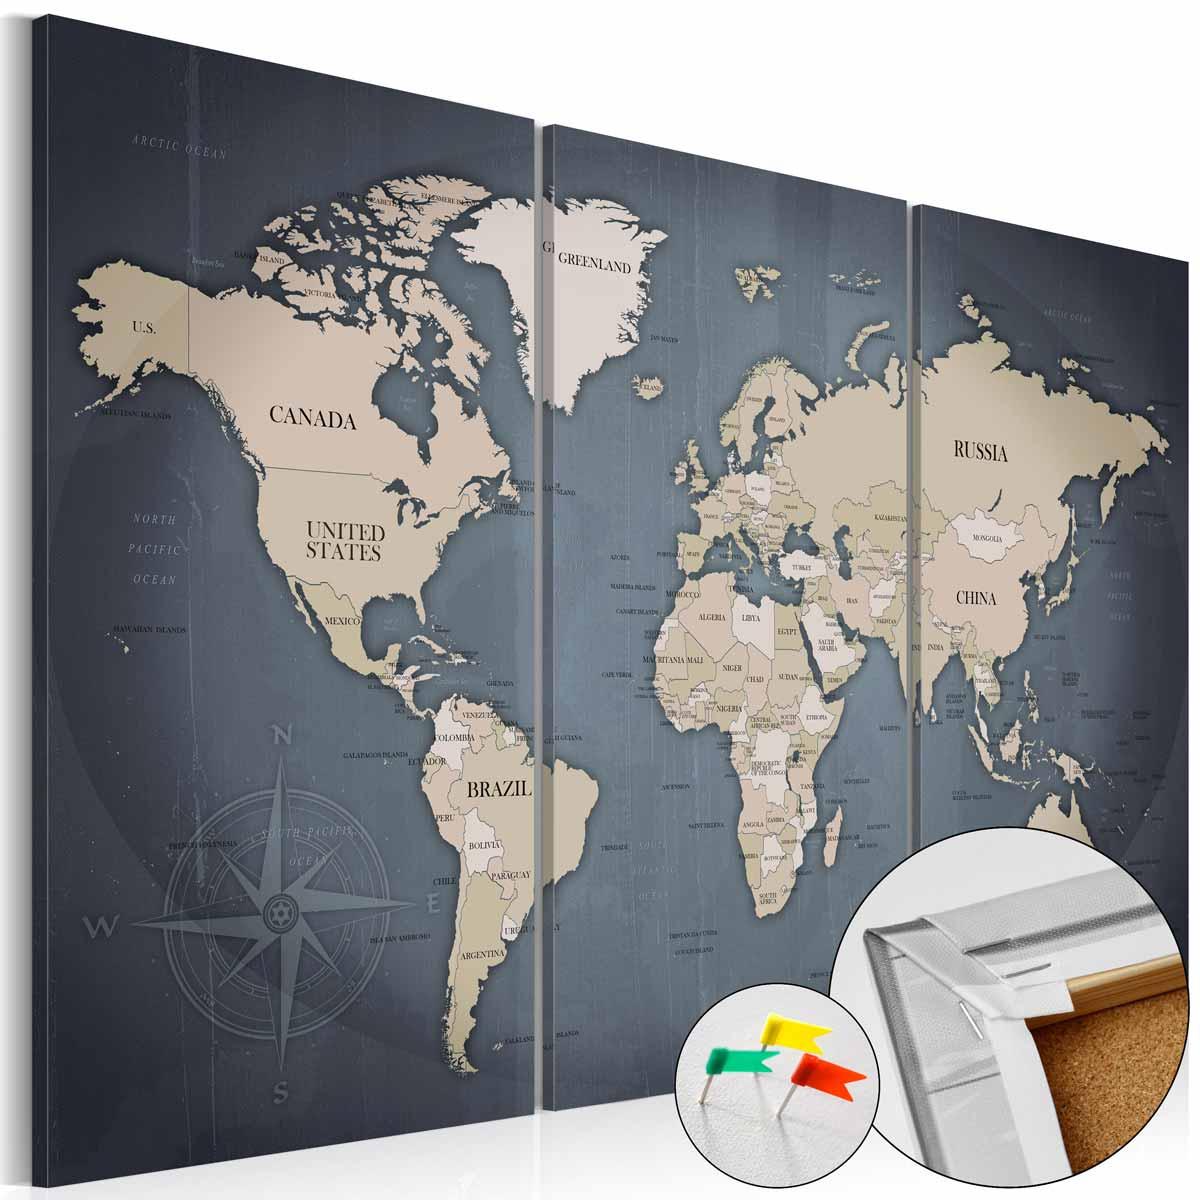 ARTGEIST Anthracitic World verdenskort billede - lysebrun og gr/sort print p kork (80x120)